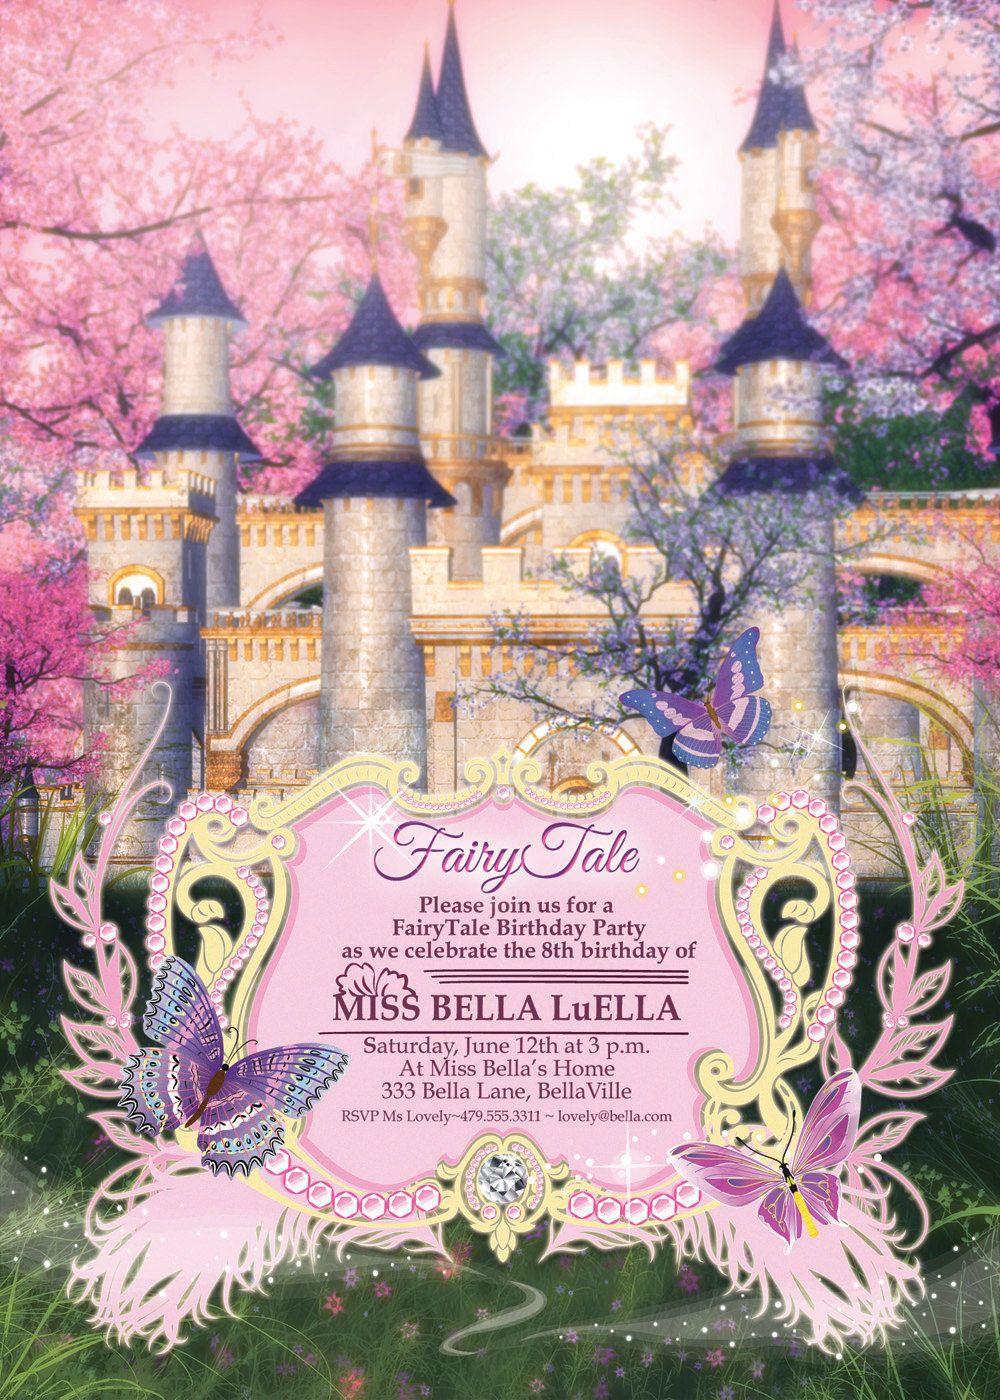 Adorable FairyTale Birthday Party Invitation by Bella LuElla. $12.75 ...